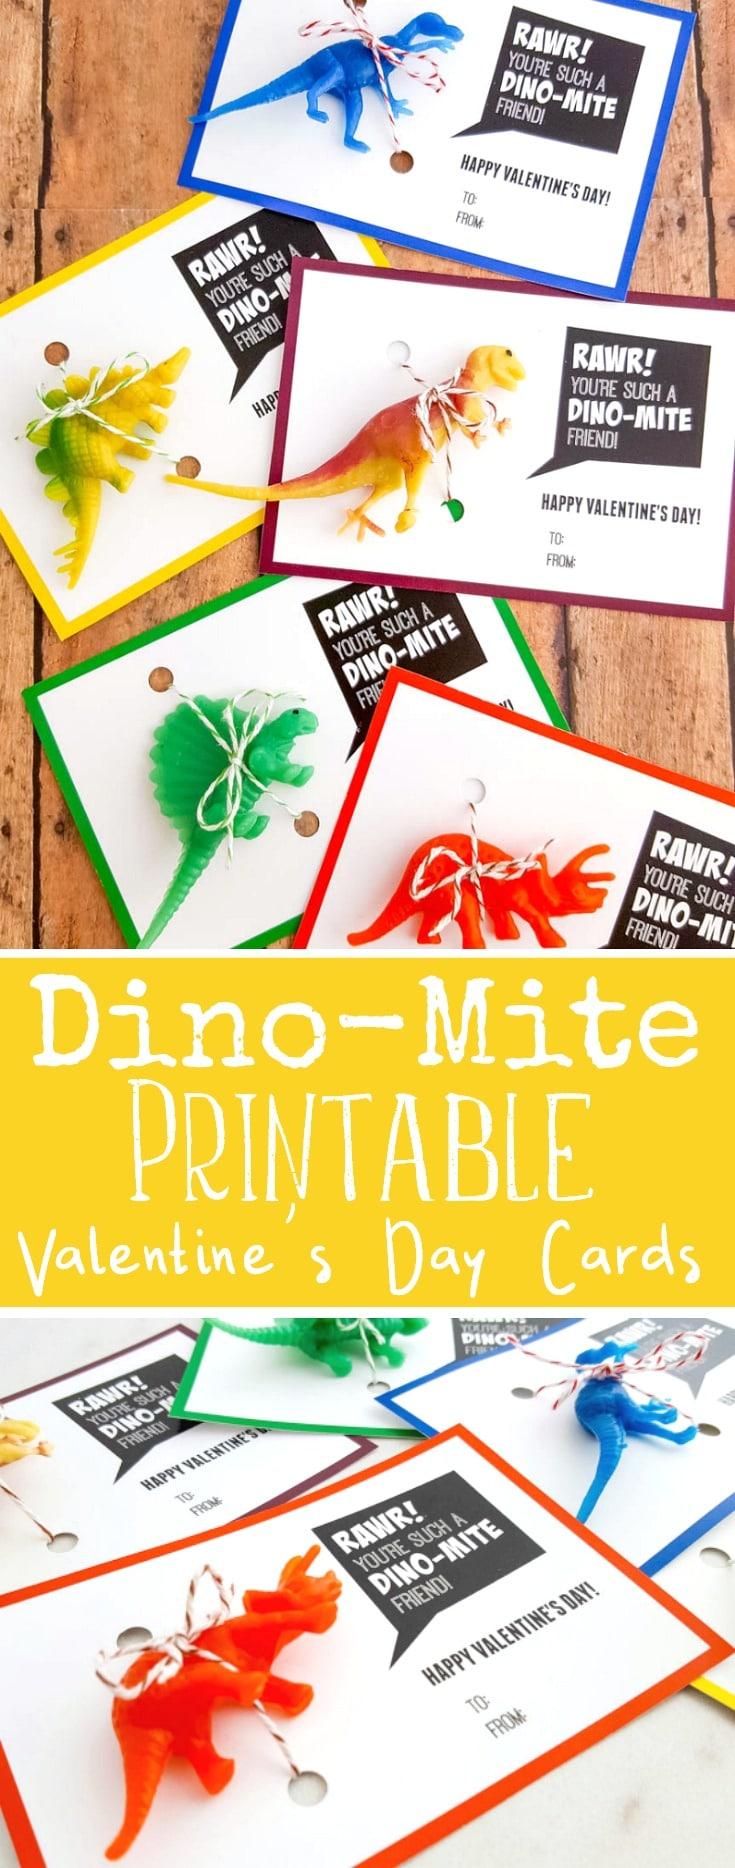 Dino-Mite Valentine Printable